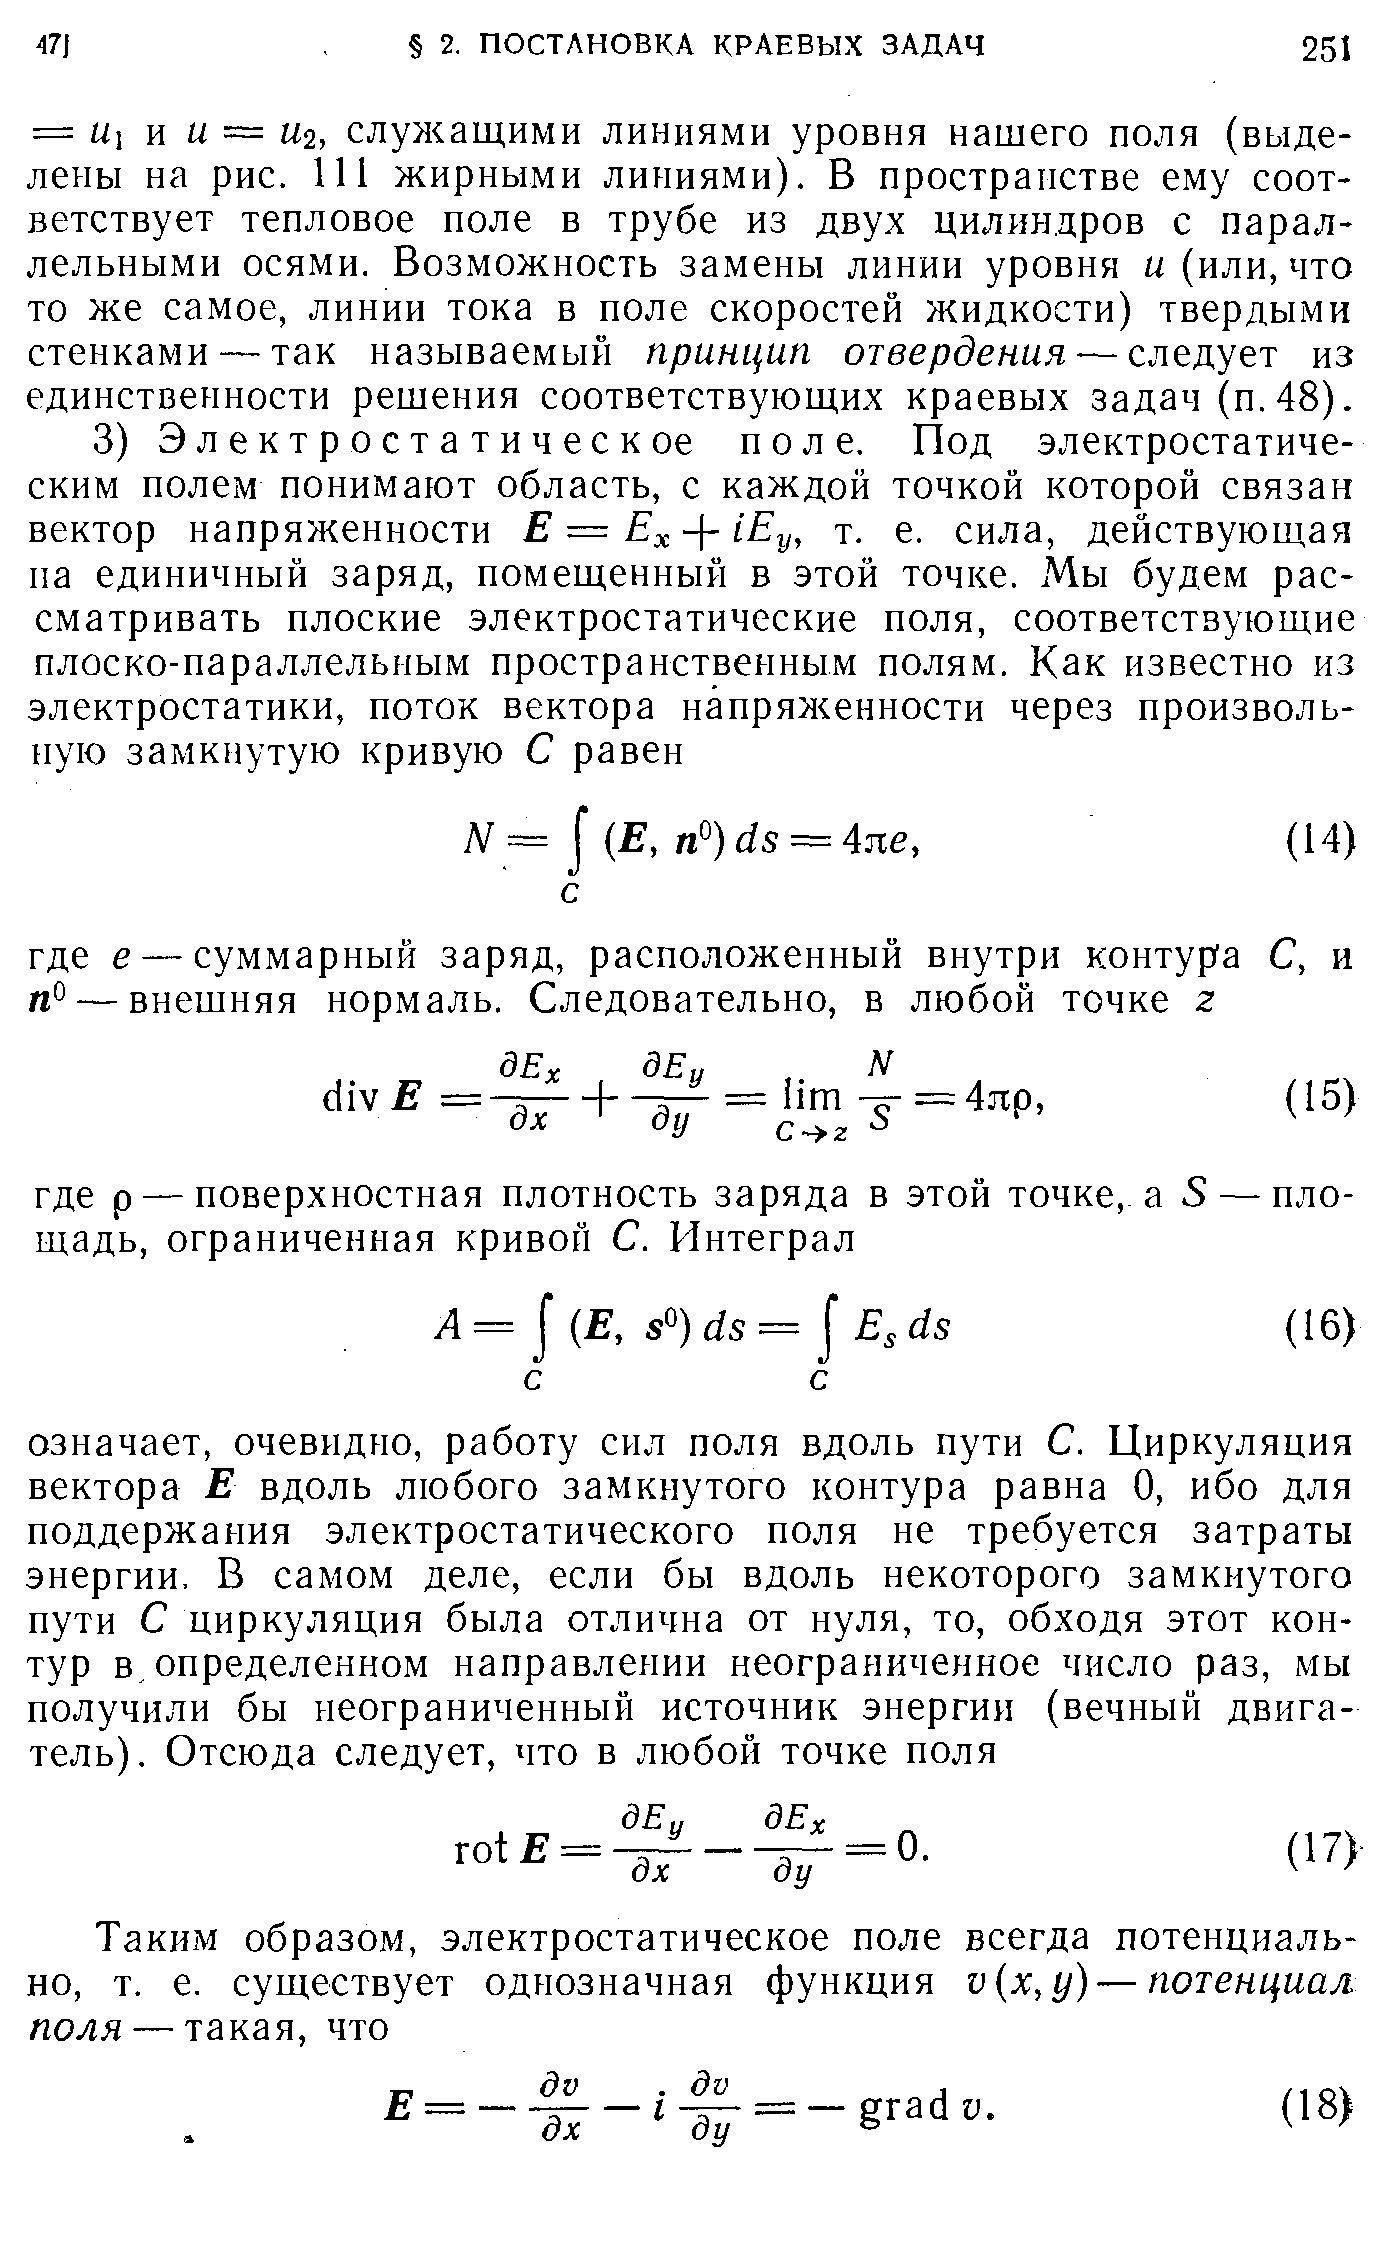 https://i5.imageban.ru/out/2019/11/14/680cb36b727123e99c96fc24bcedfcf7.jpg